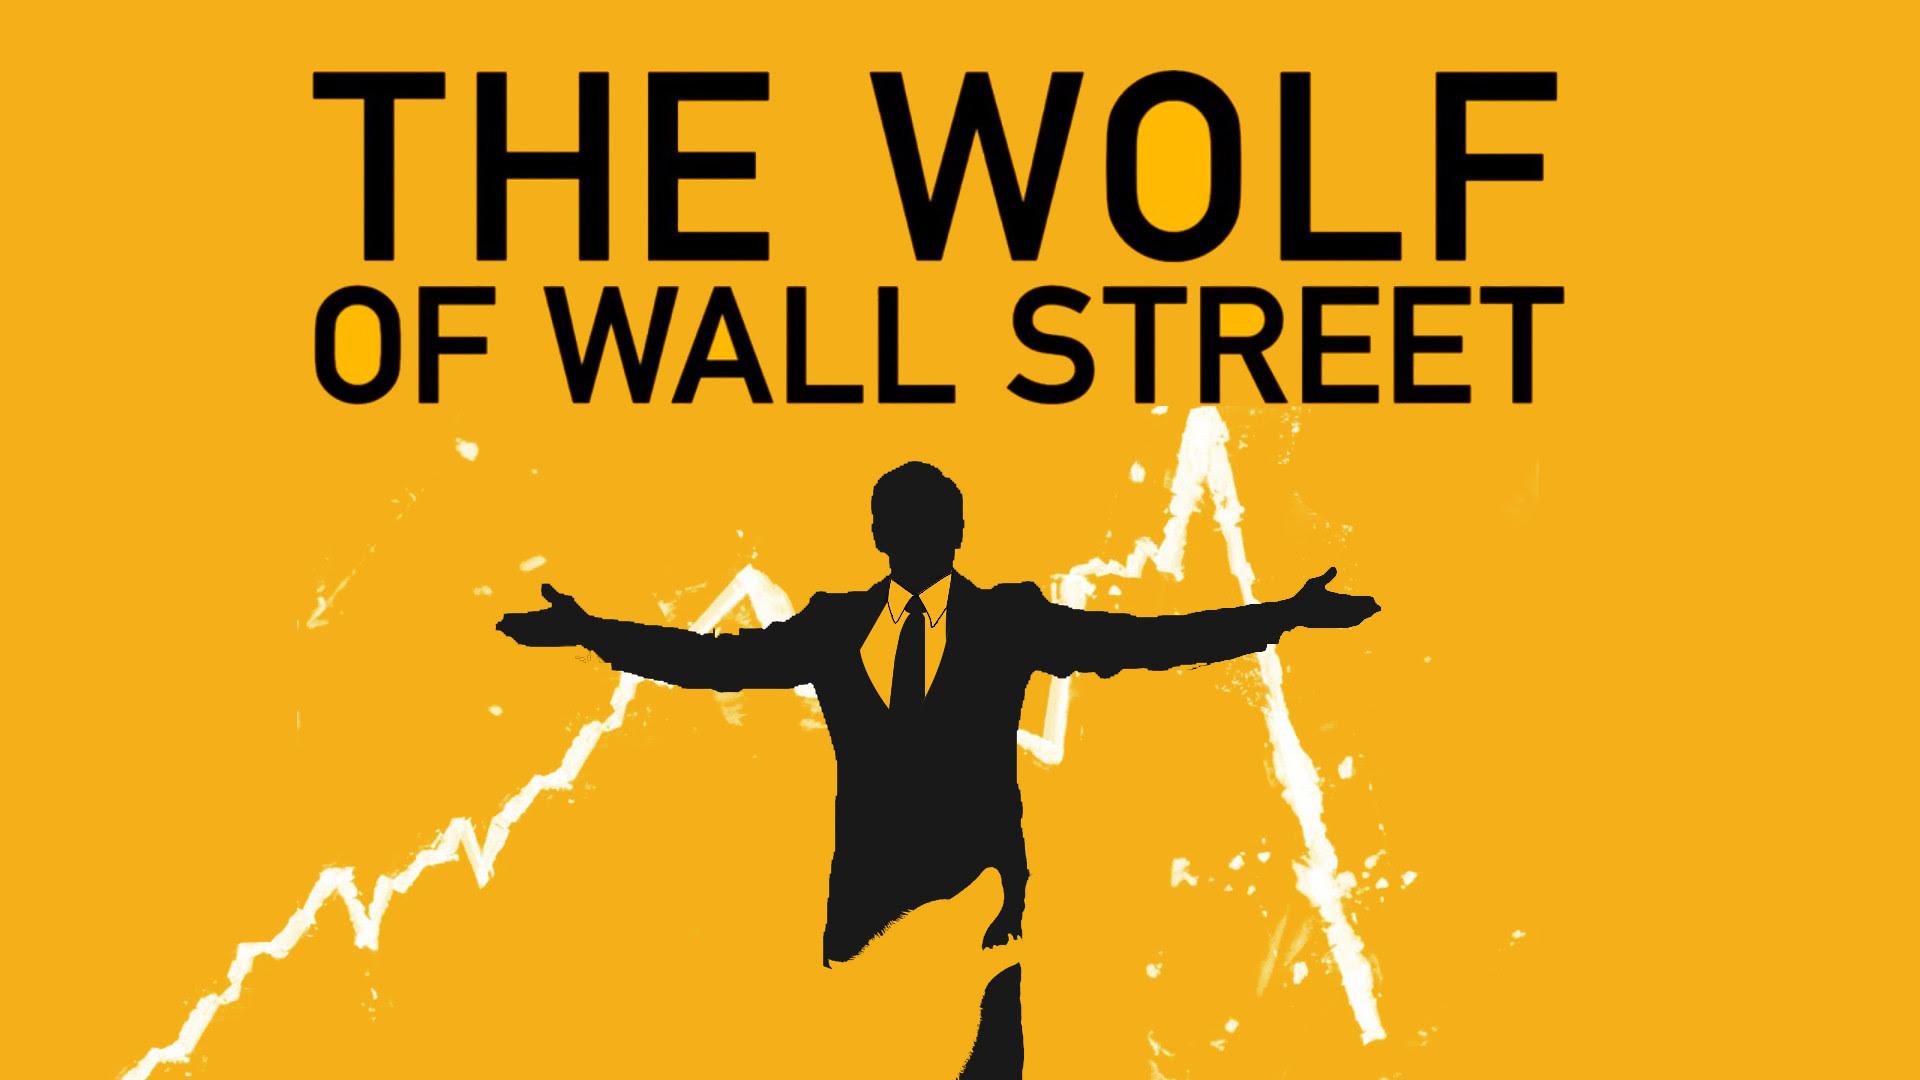 Wall Street Wallpaper Hd 69 Images